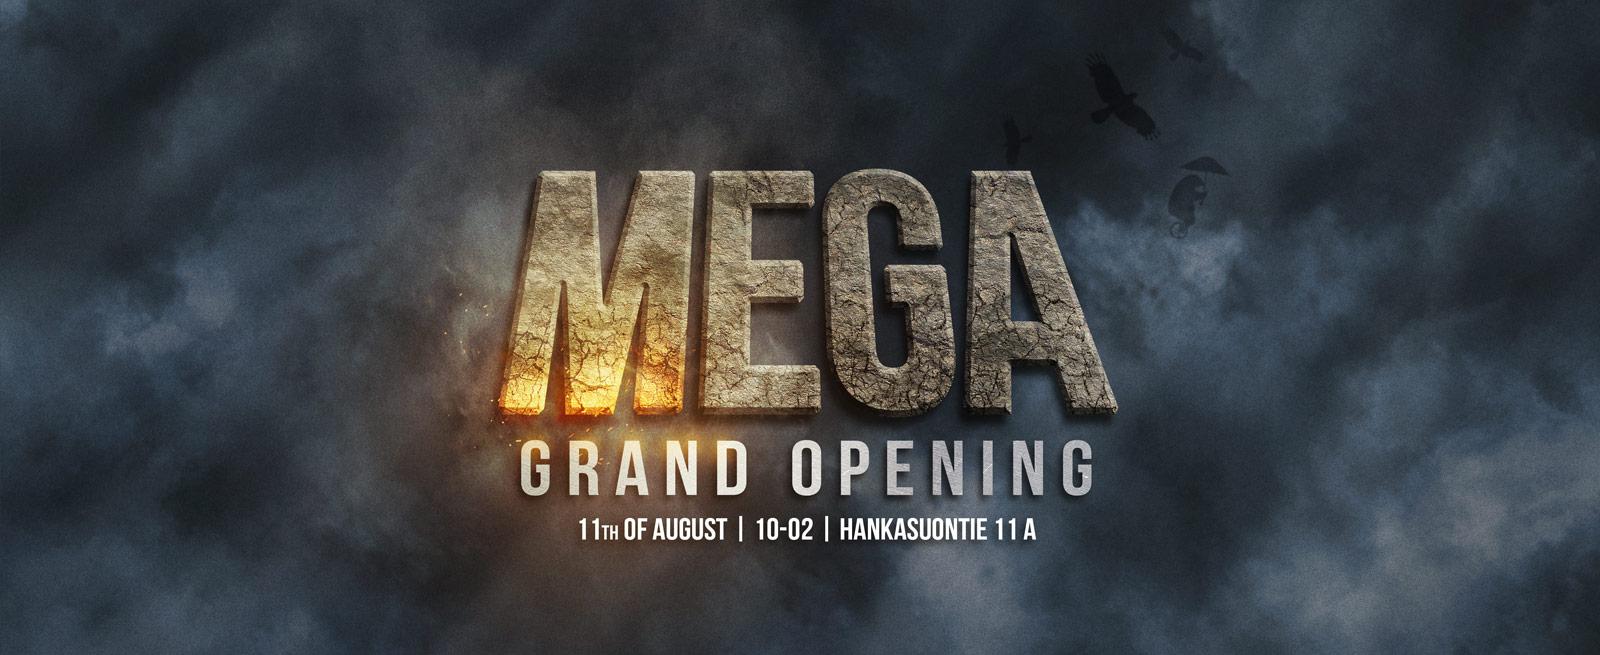 Varusteleka Mega Grand Opening 2018